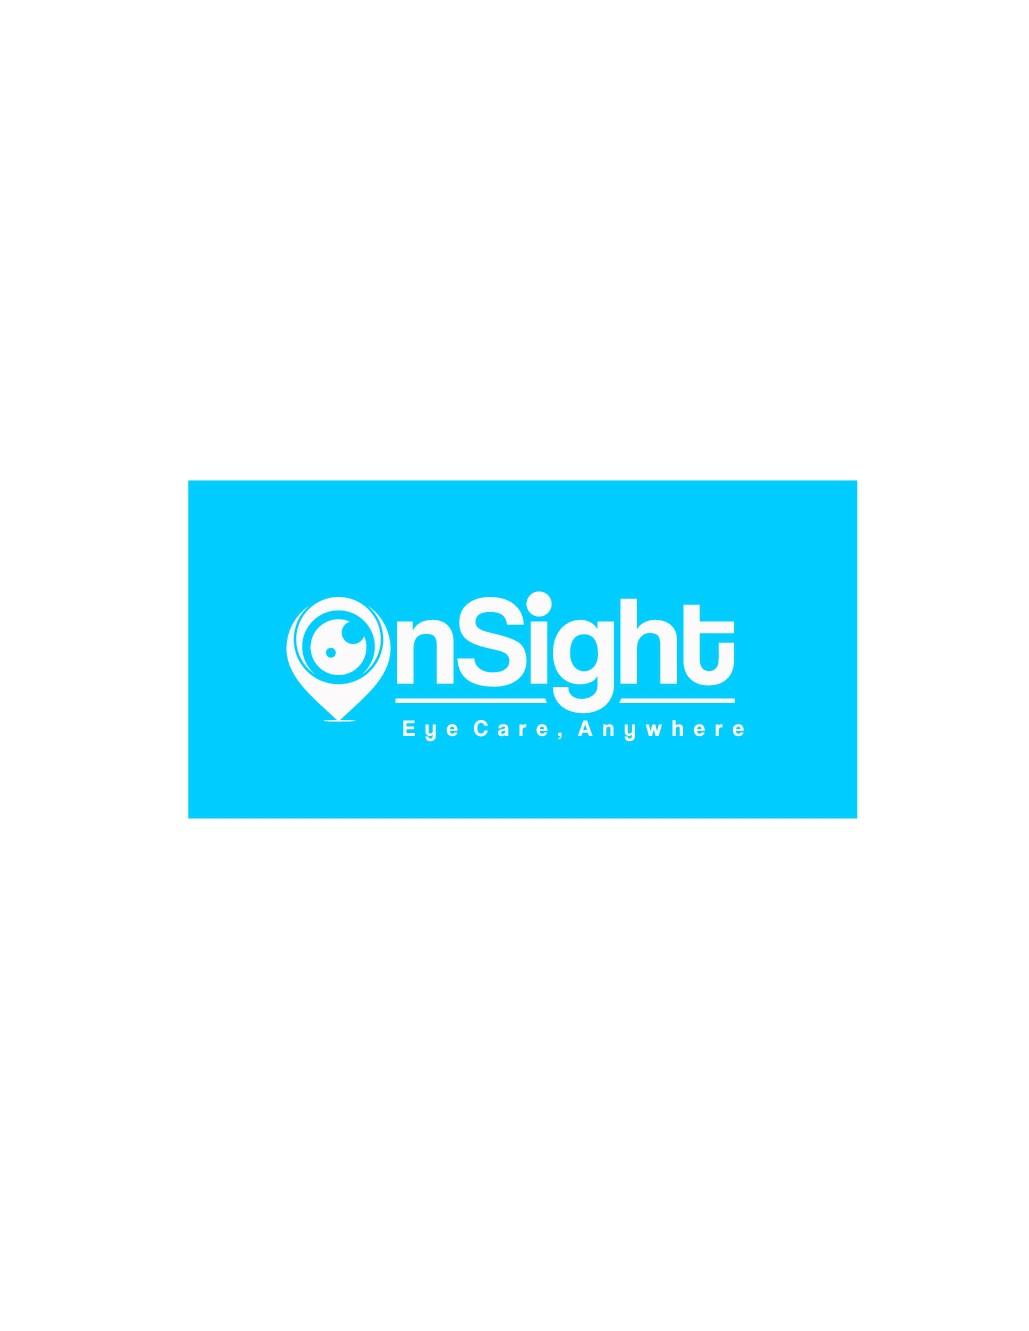 Logo for innovative health and wellness service